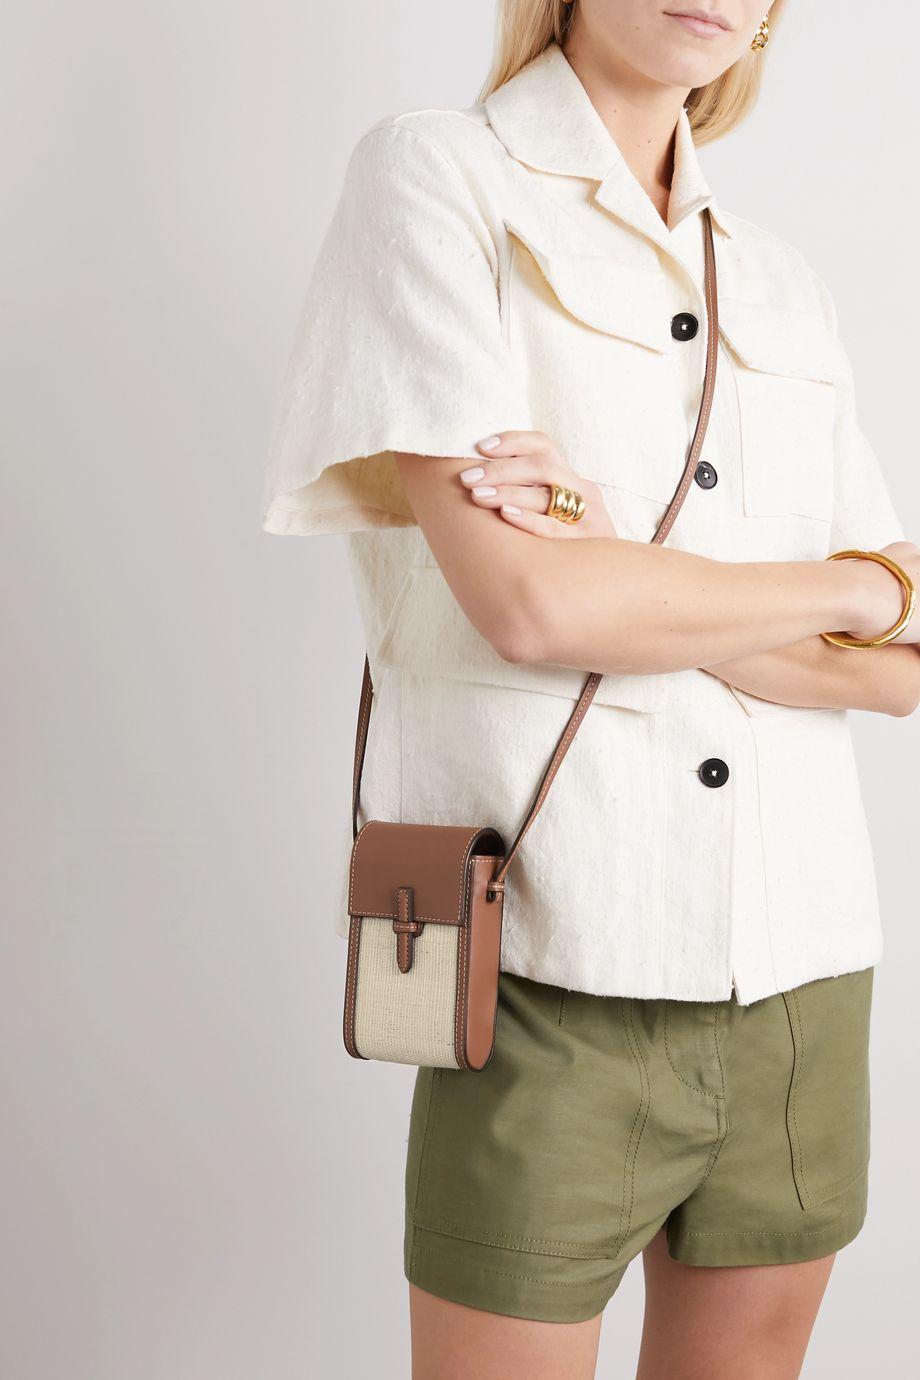 Hunting Season Leather and raffia shoulder bag